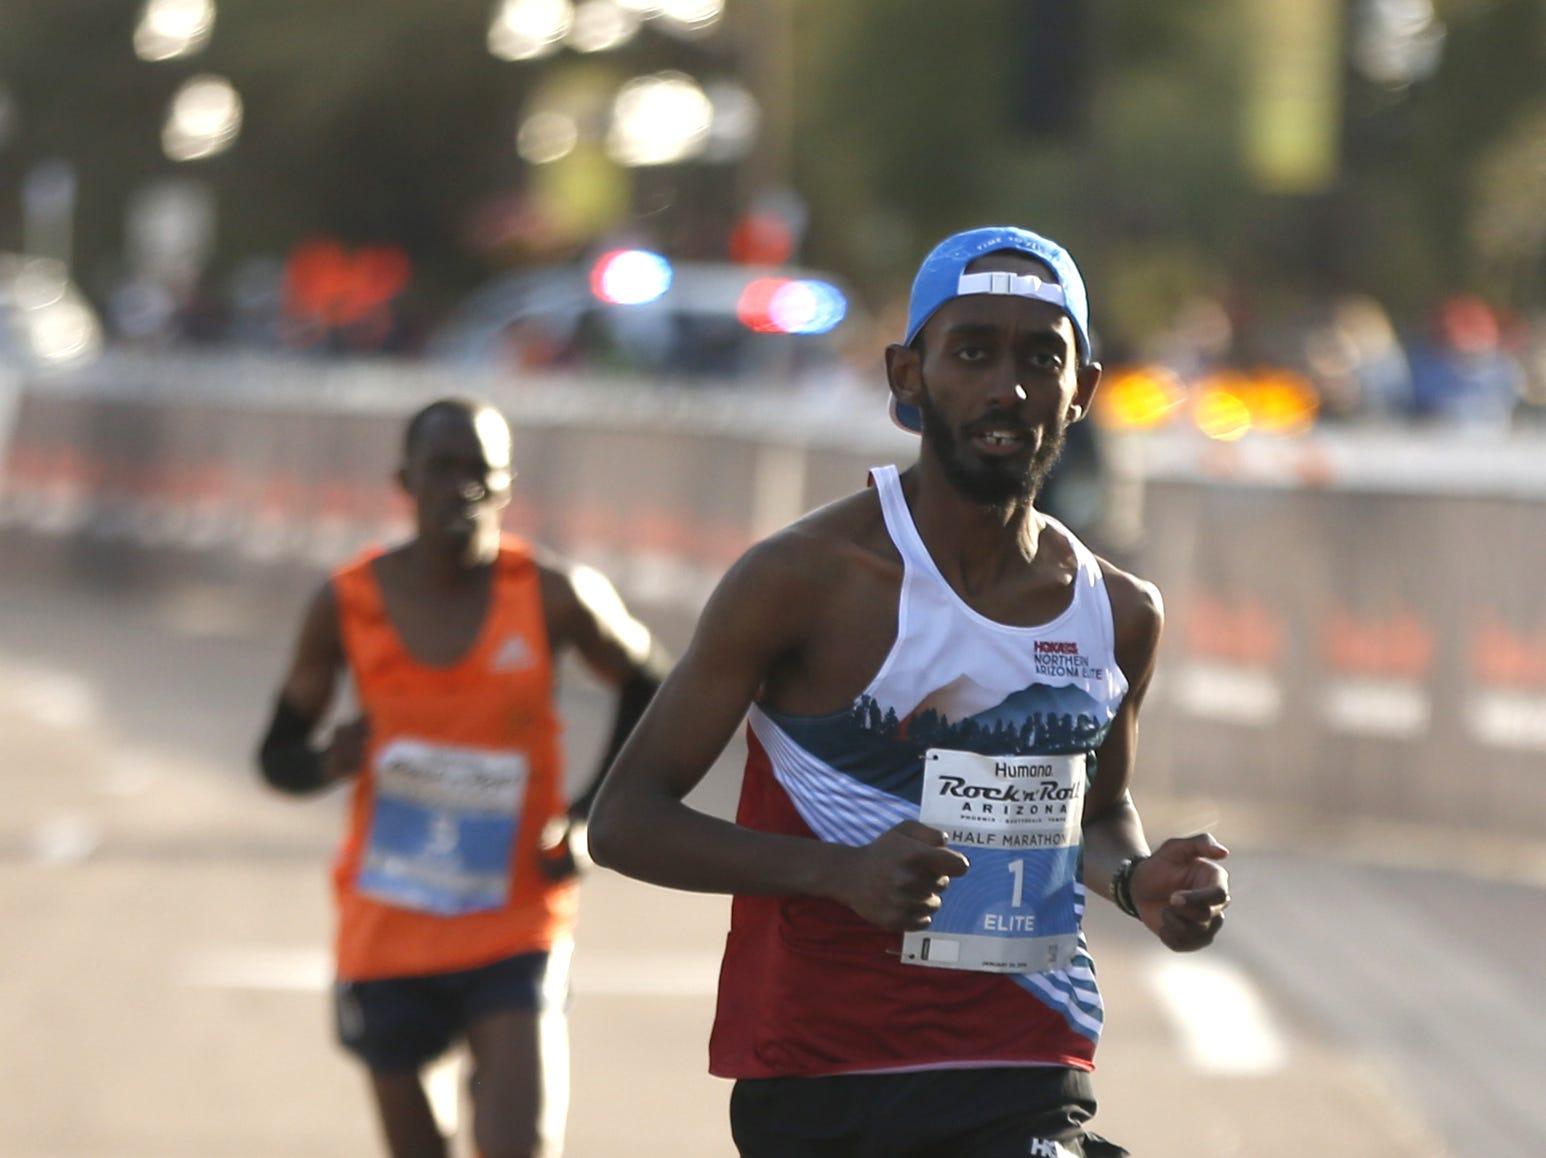 Kiya Dendena (1) comes in second place during the Rock 'N' Roll half-marathon in Tempe on Jan. 20, 2019.